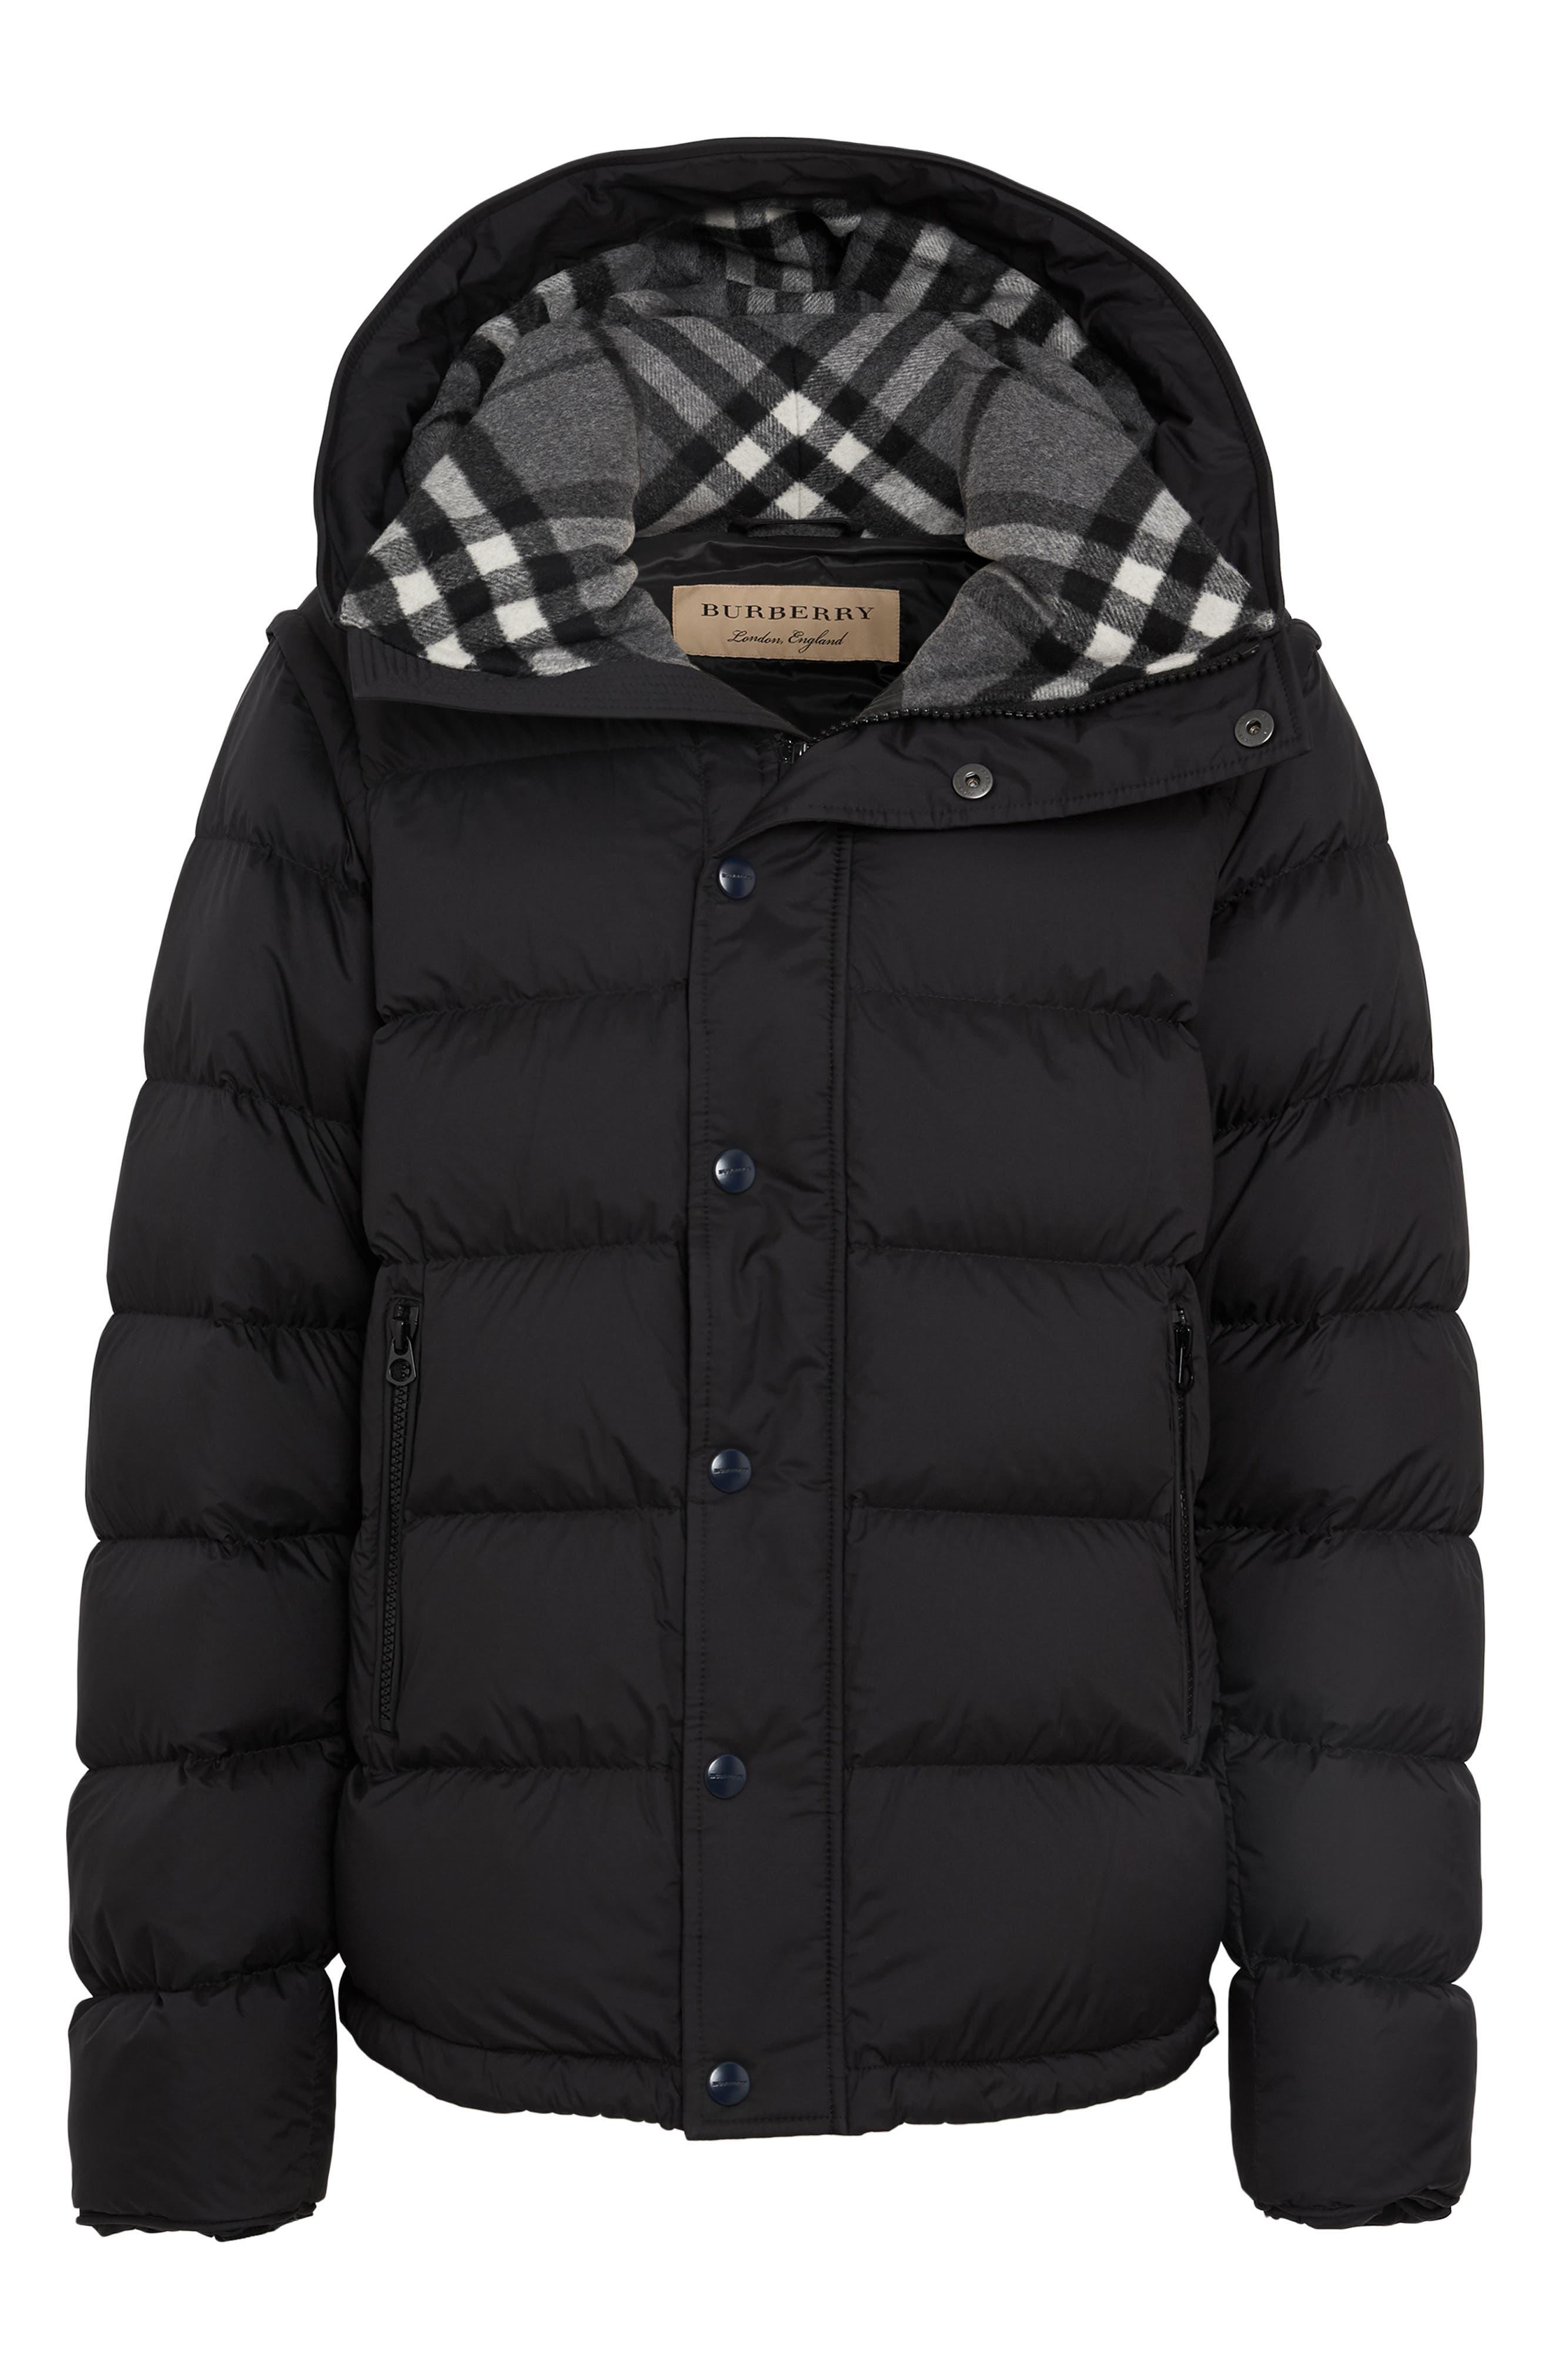 Hartley Hybrid Jacket with Detachable Sleeves,                             Alternate thumbnail 5, color,                             001